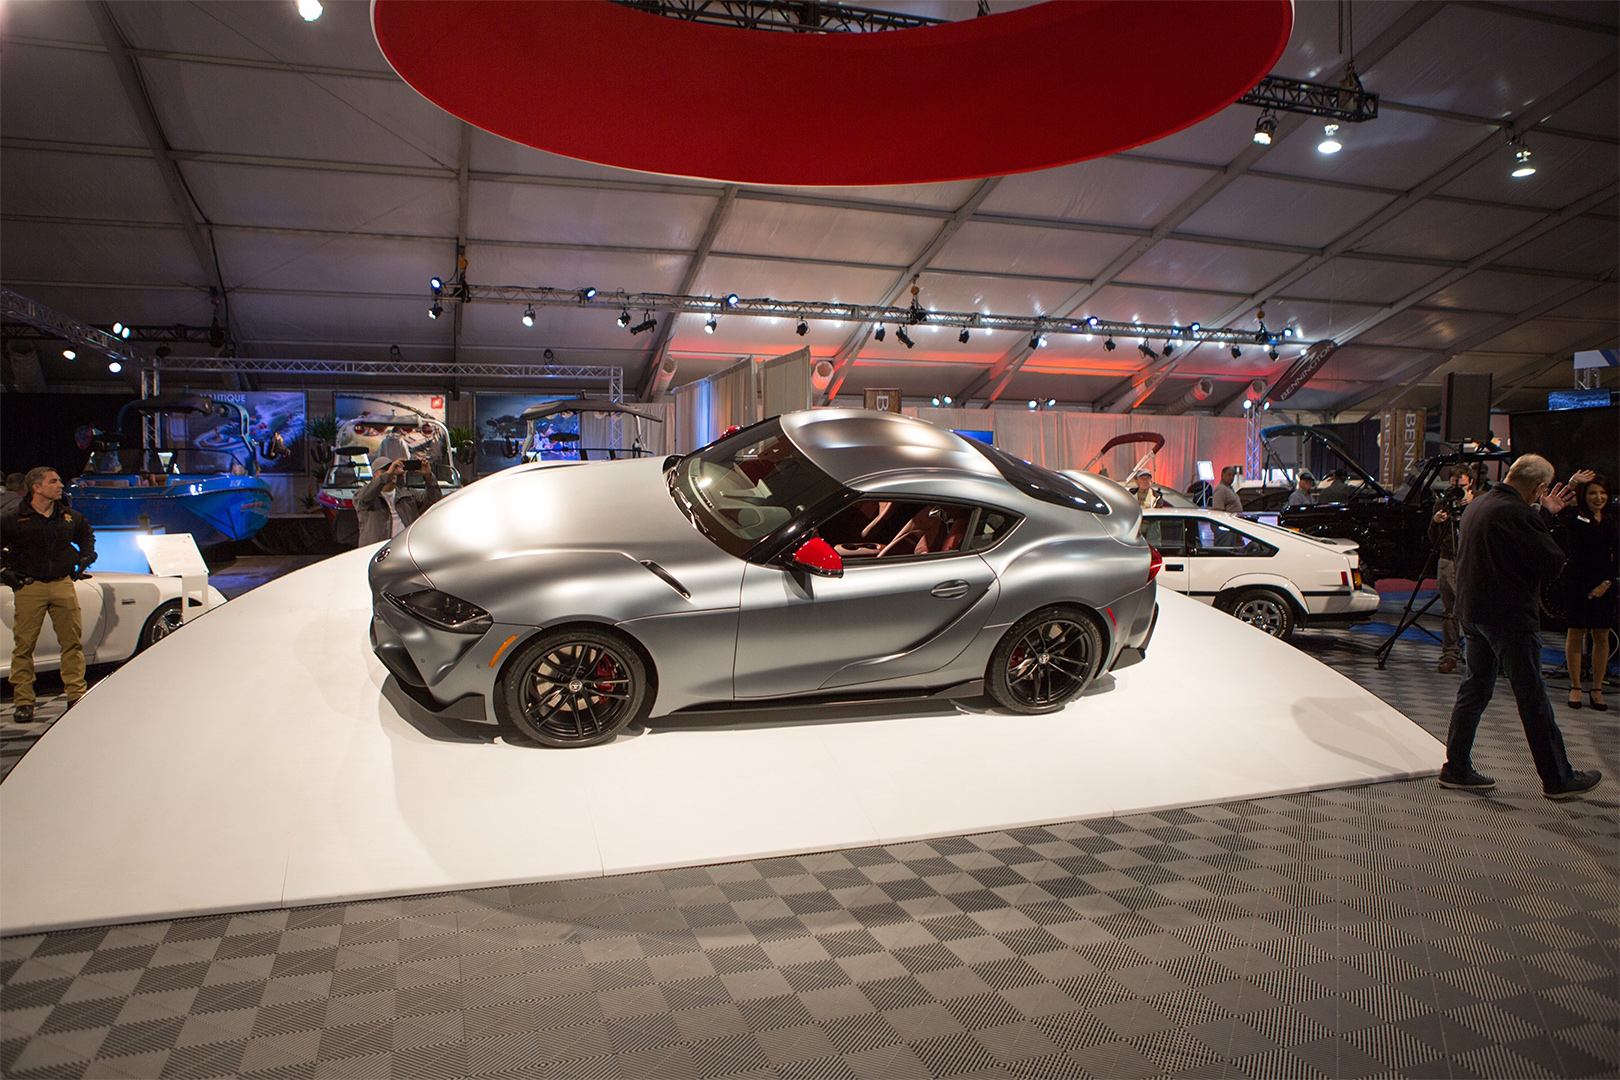 TrackWorthy - 2020 Toyota Supra Auction at Barrett-Jackson Scottsdale (2)